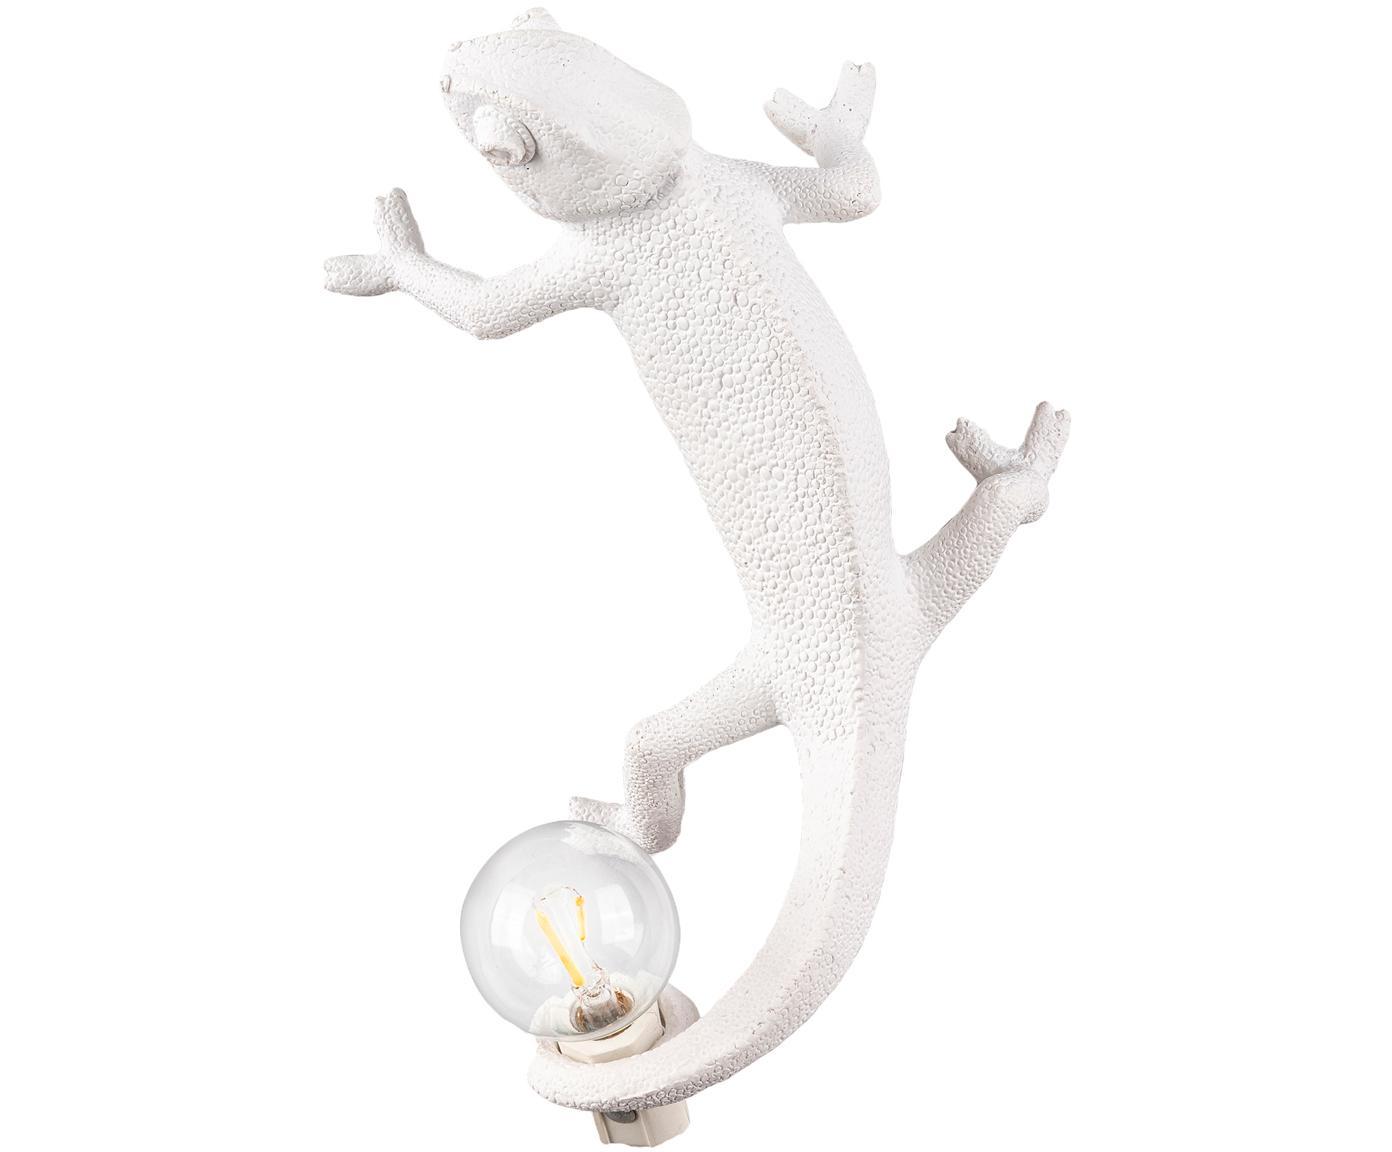 Aplique Chameleon, con enchufe, Poliresina, Blanco, An 7 x Al 17 cm